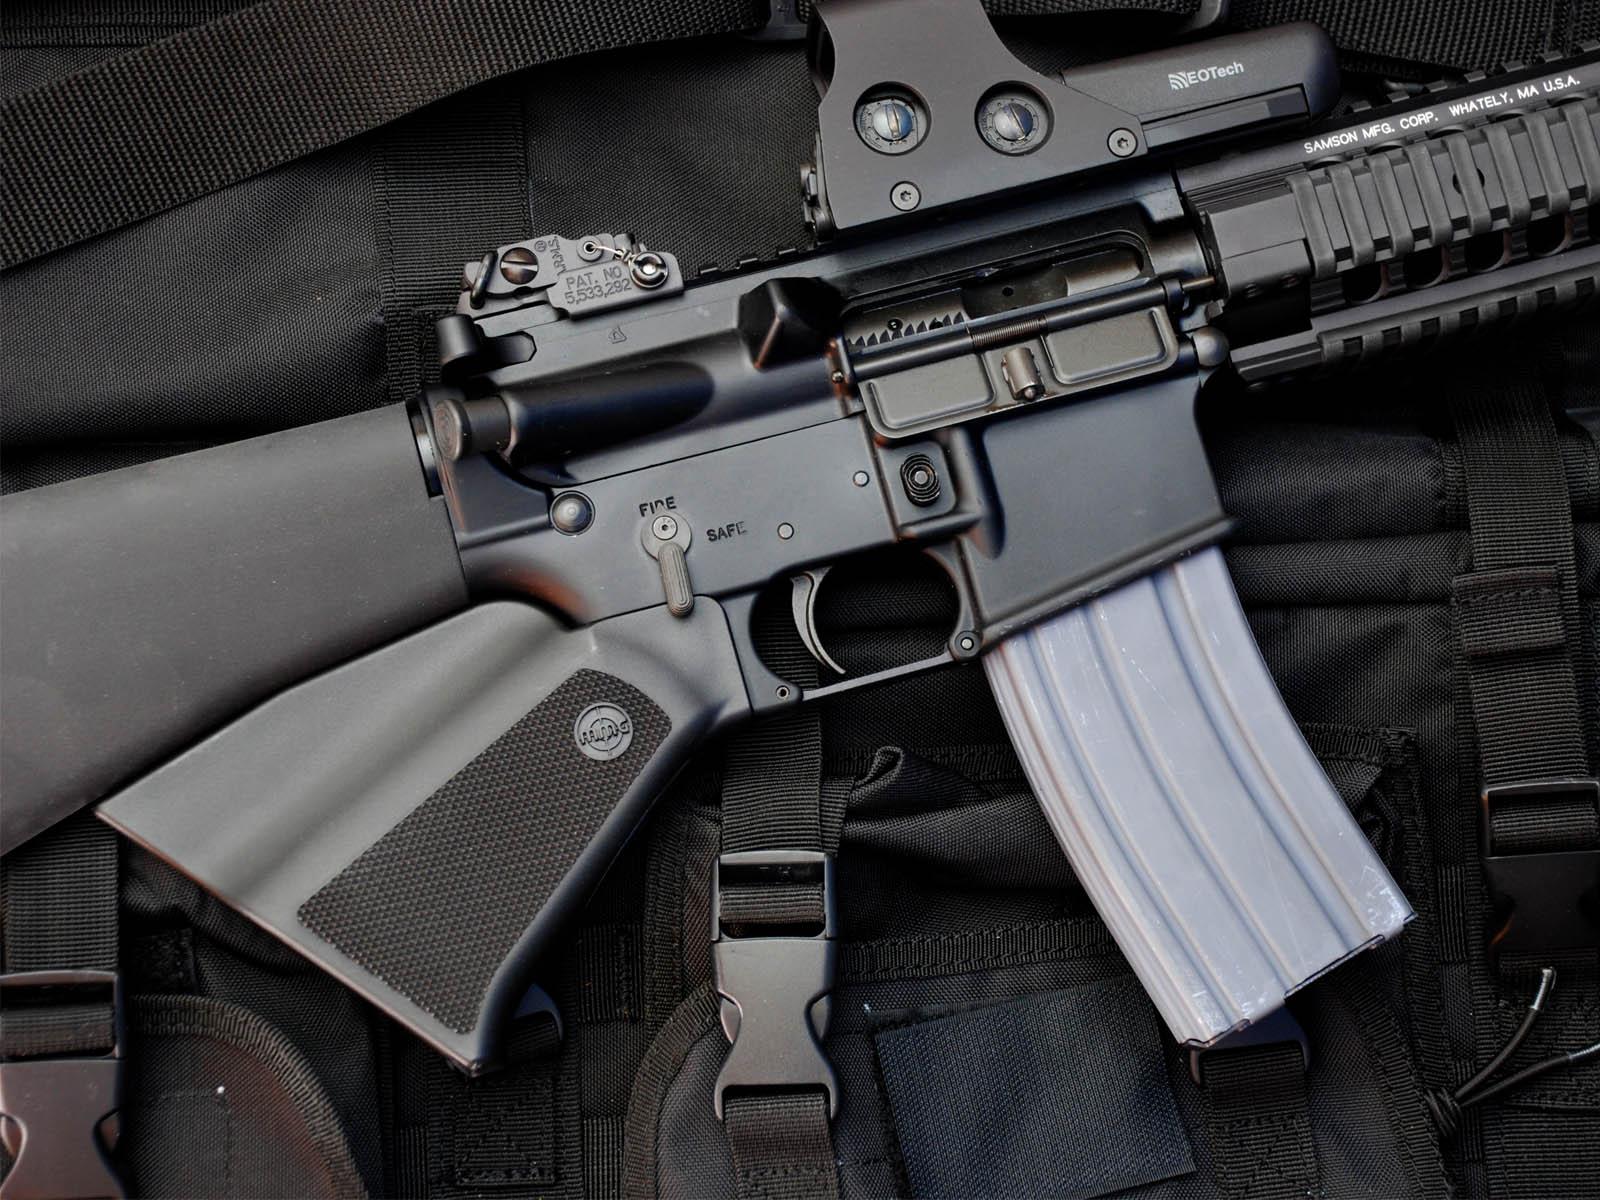 MMG-AR - MonsterMan Grips California Legal AR15 & AK47 Grip